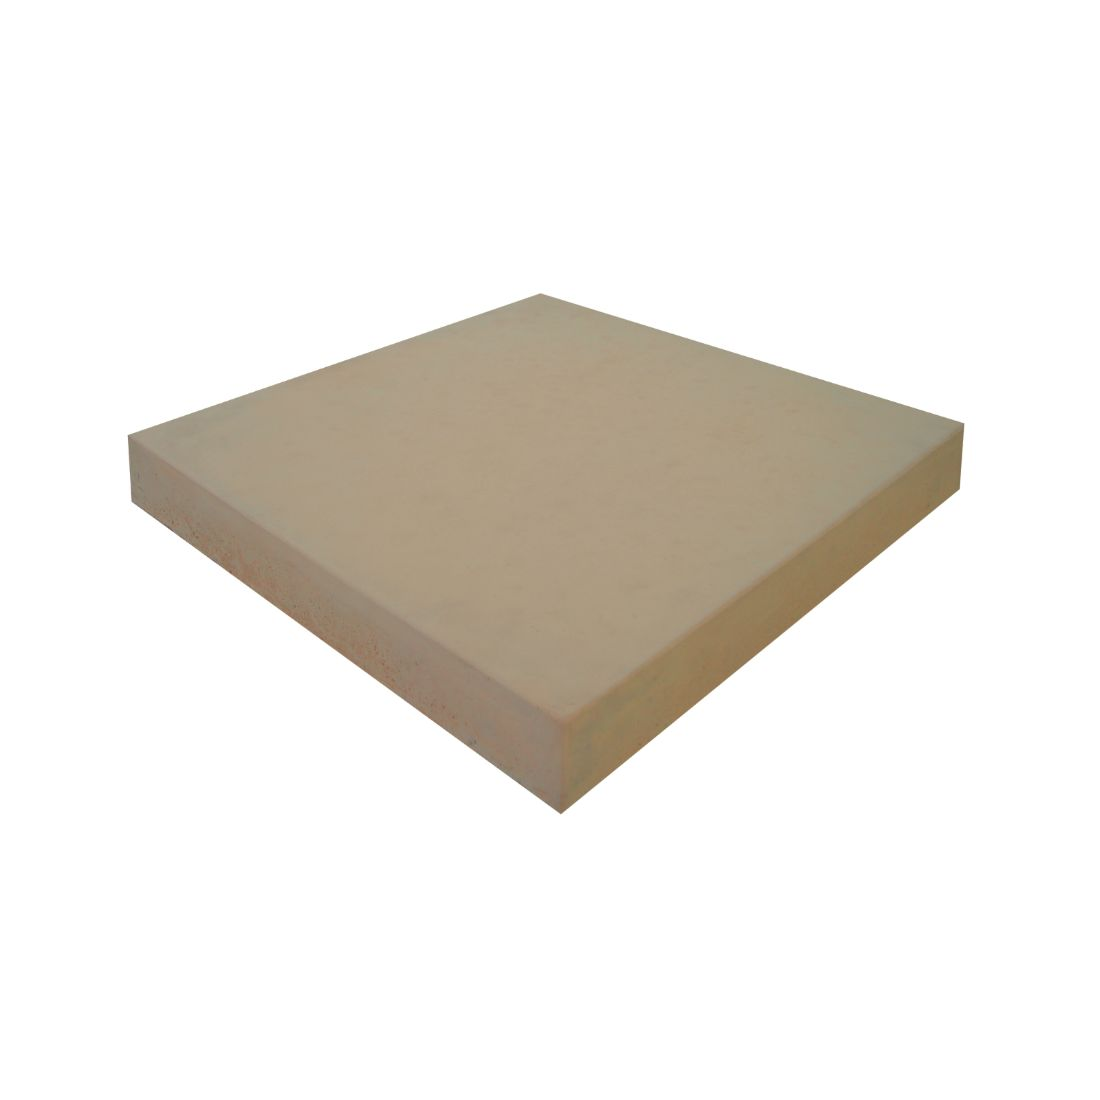 Milano Concrete Paver 600 x 600 x 37mm Cream Sands